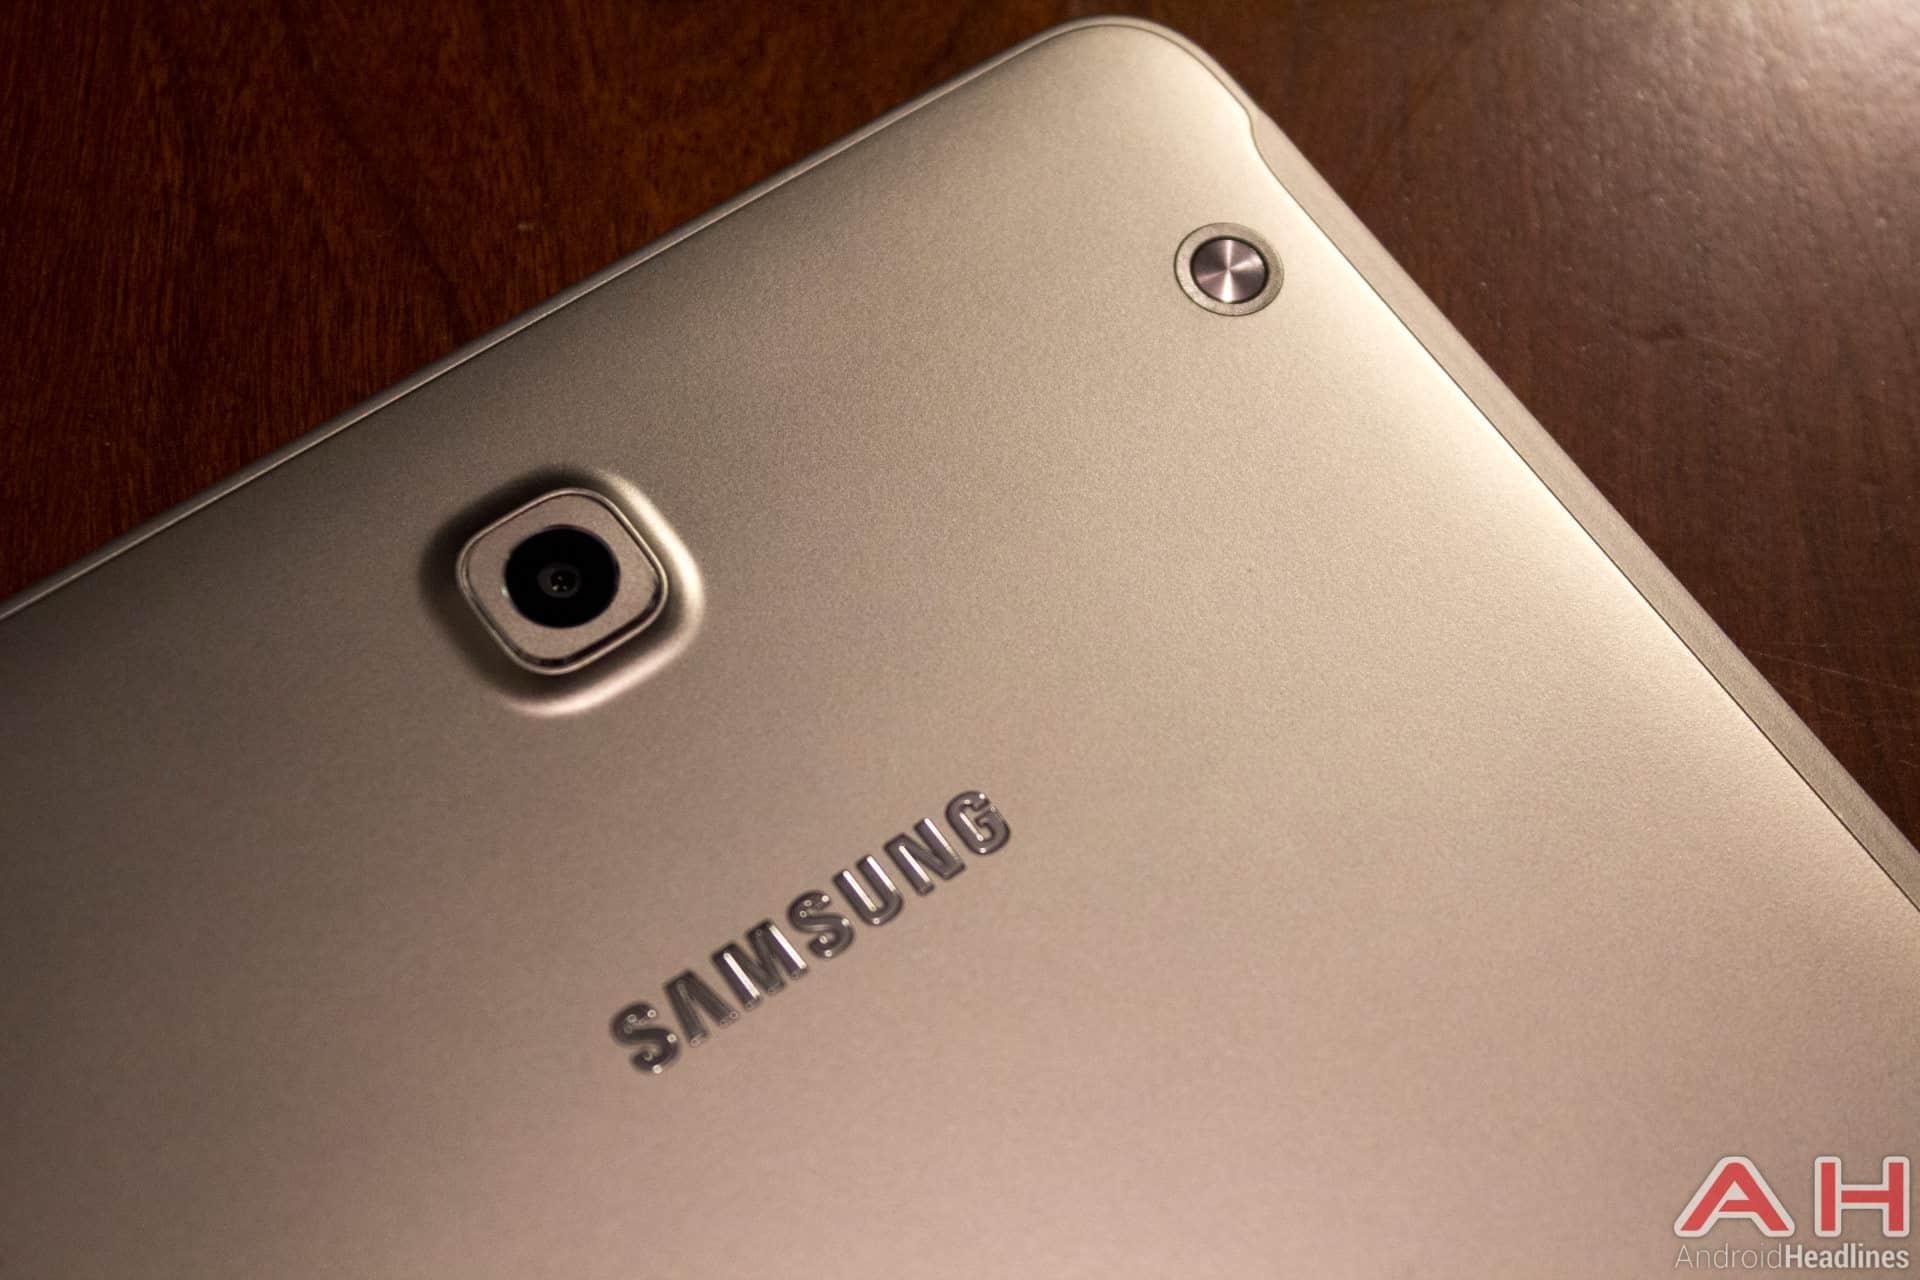 Samsung-Galaxy-Tab-S2-AH-09